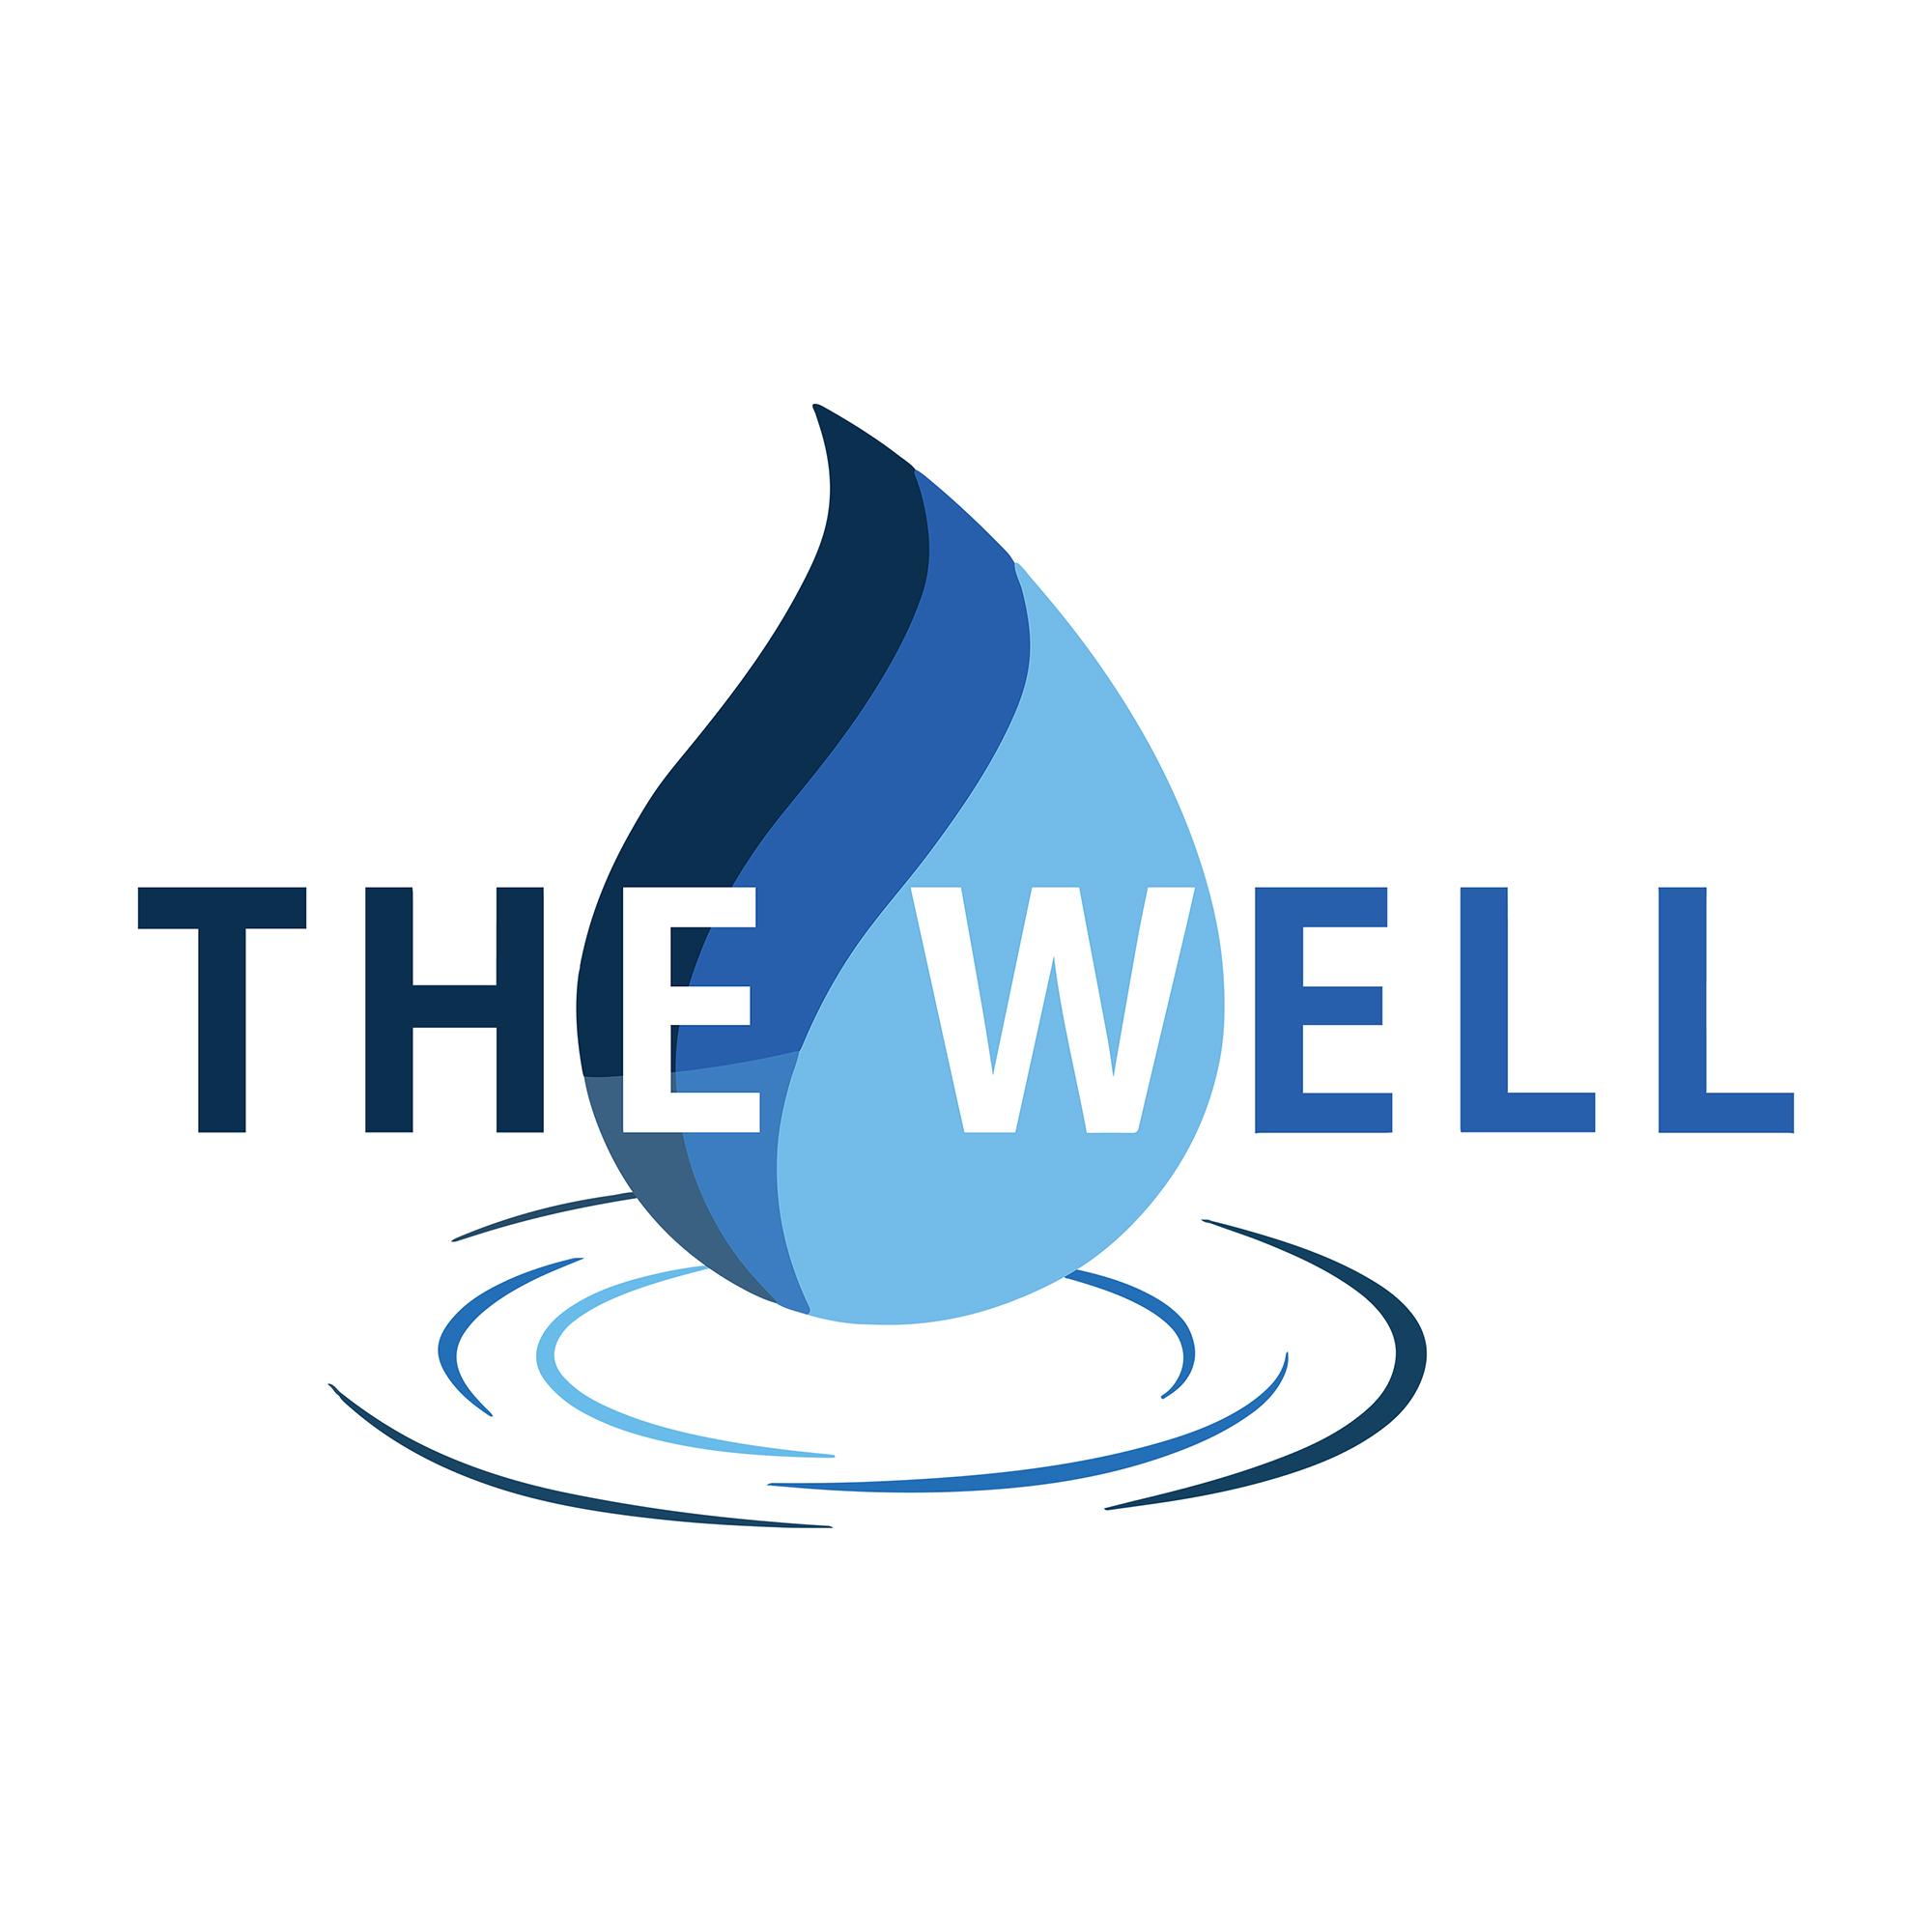 TheWell.jpg